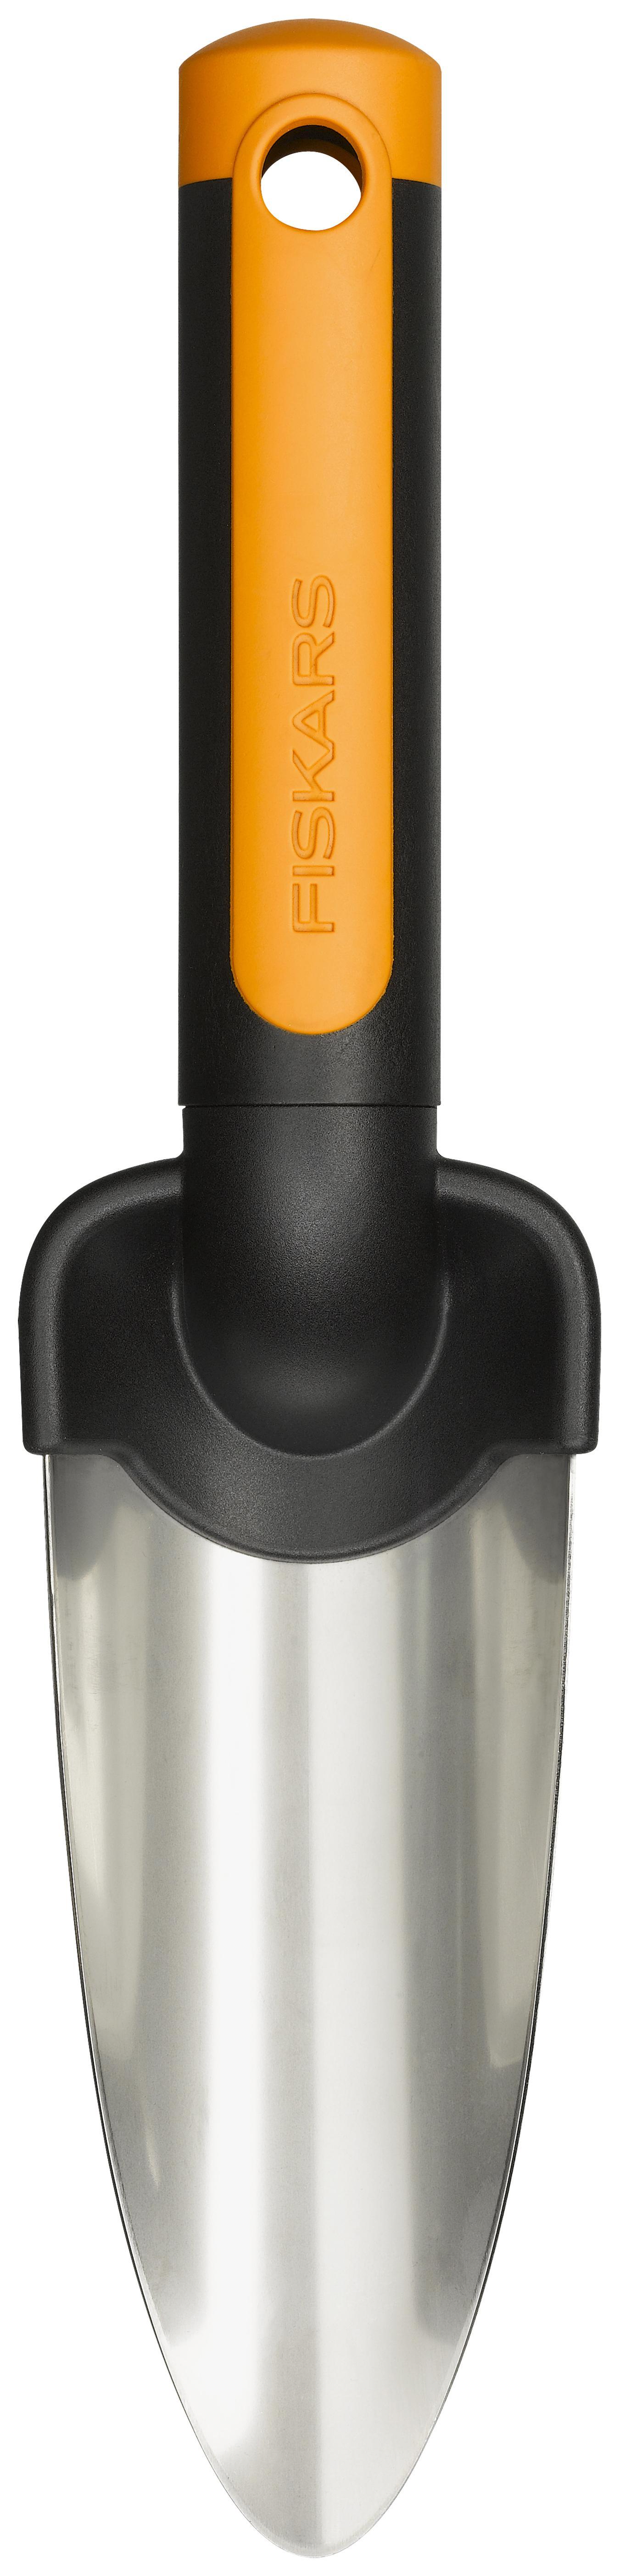 Совок Fiskars 137210 для рассады